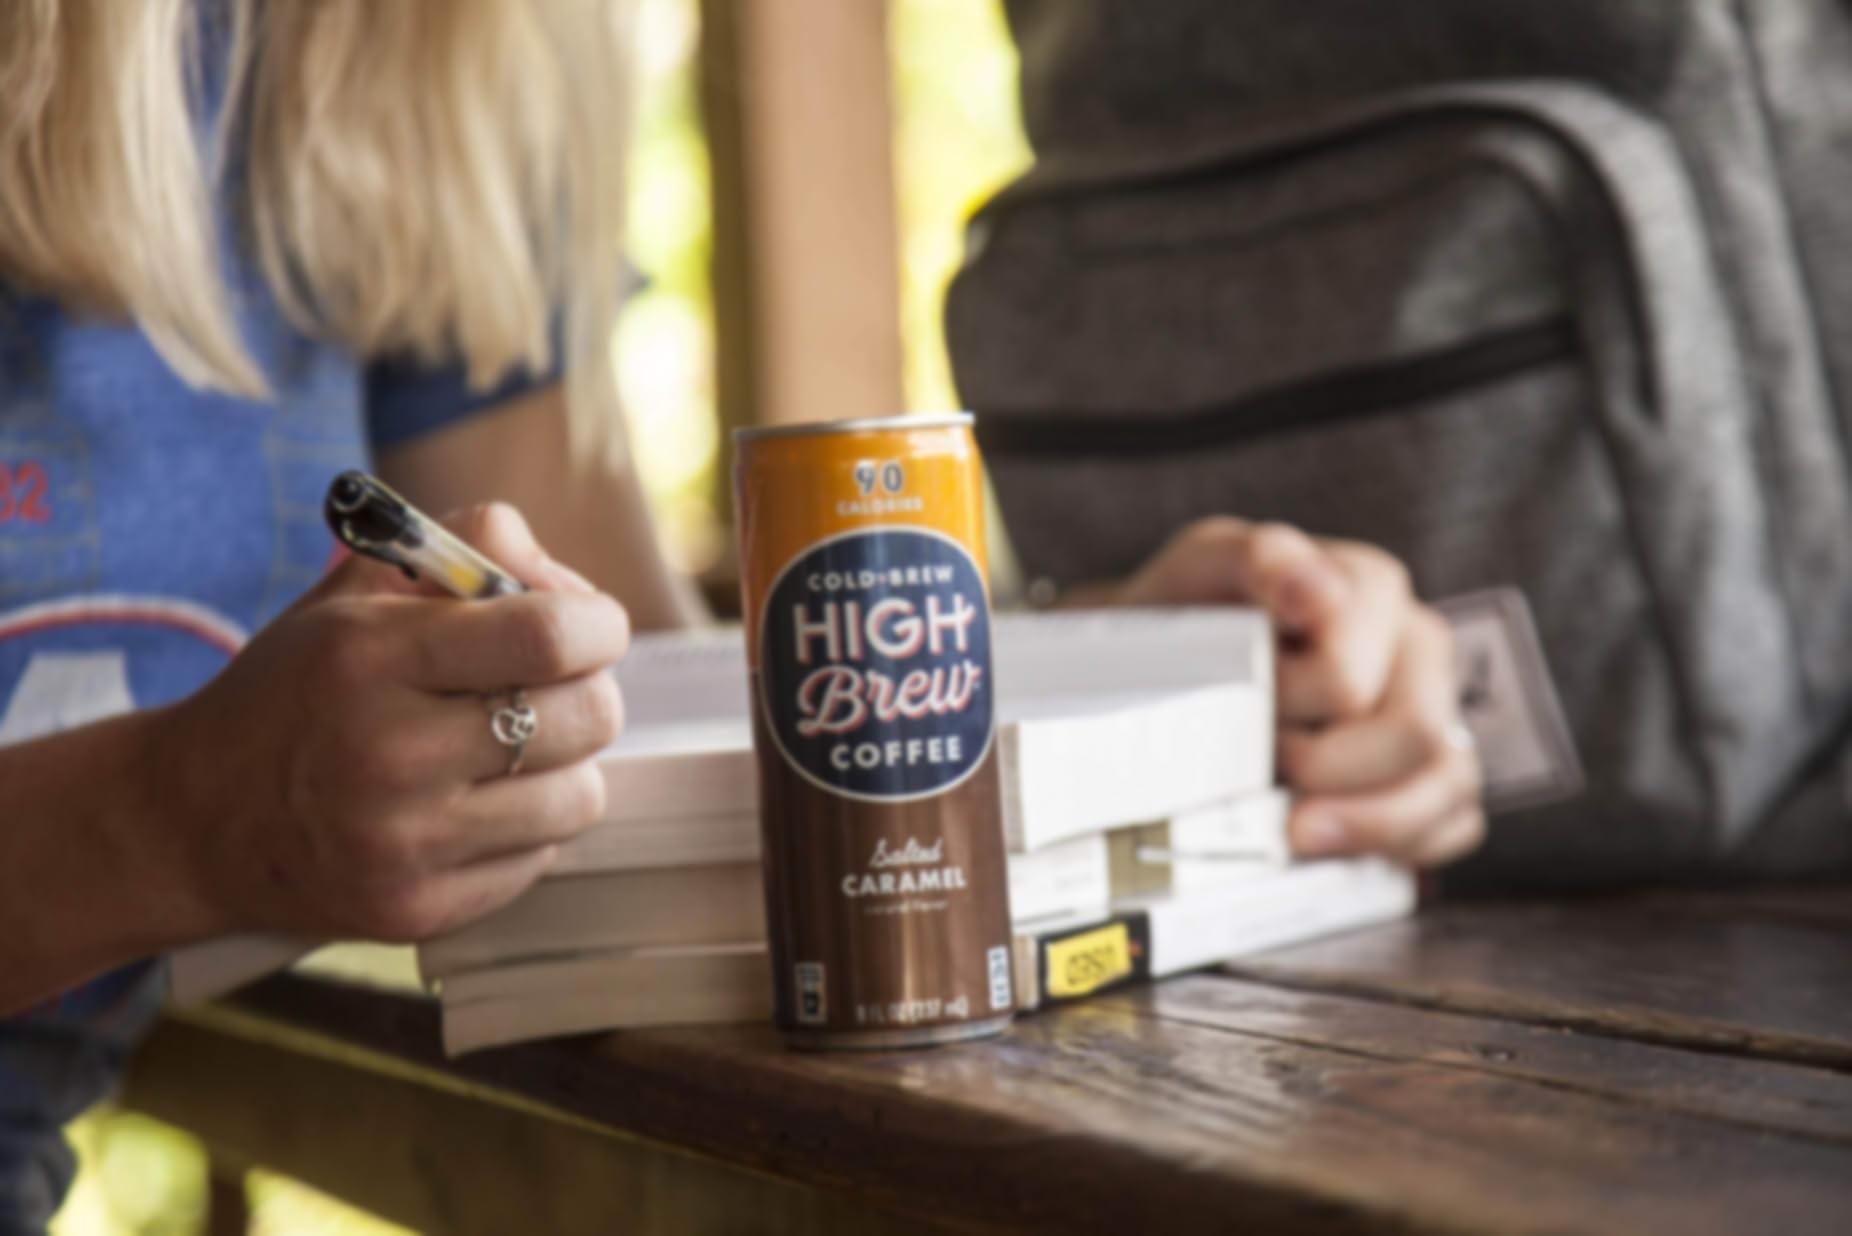 High Brew Coffee와 함께 공부하는 학생은 책에 집중할 수 있습니다.